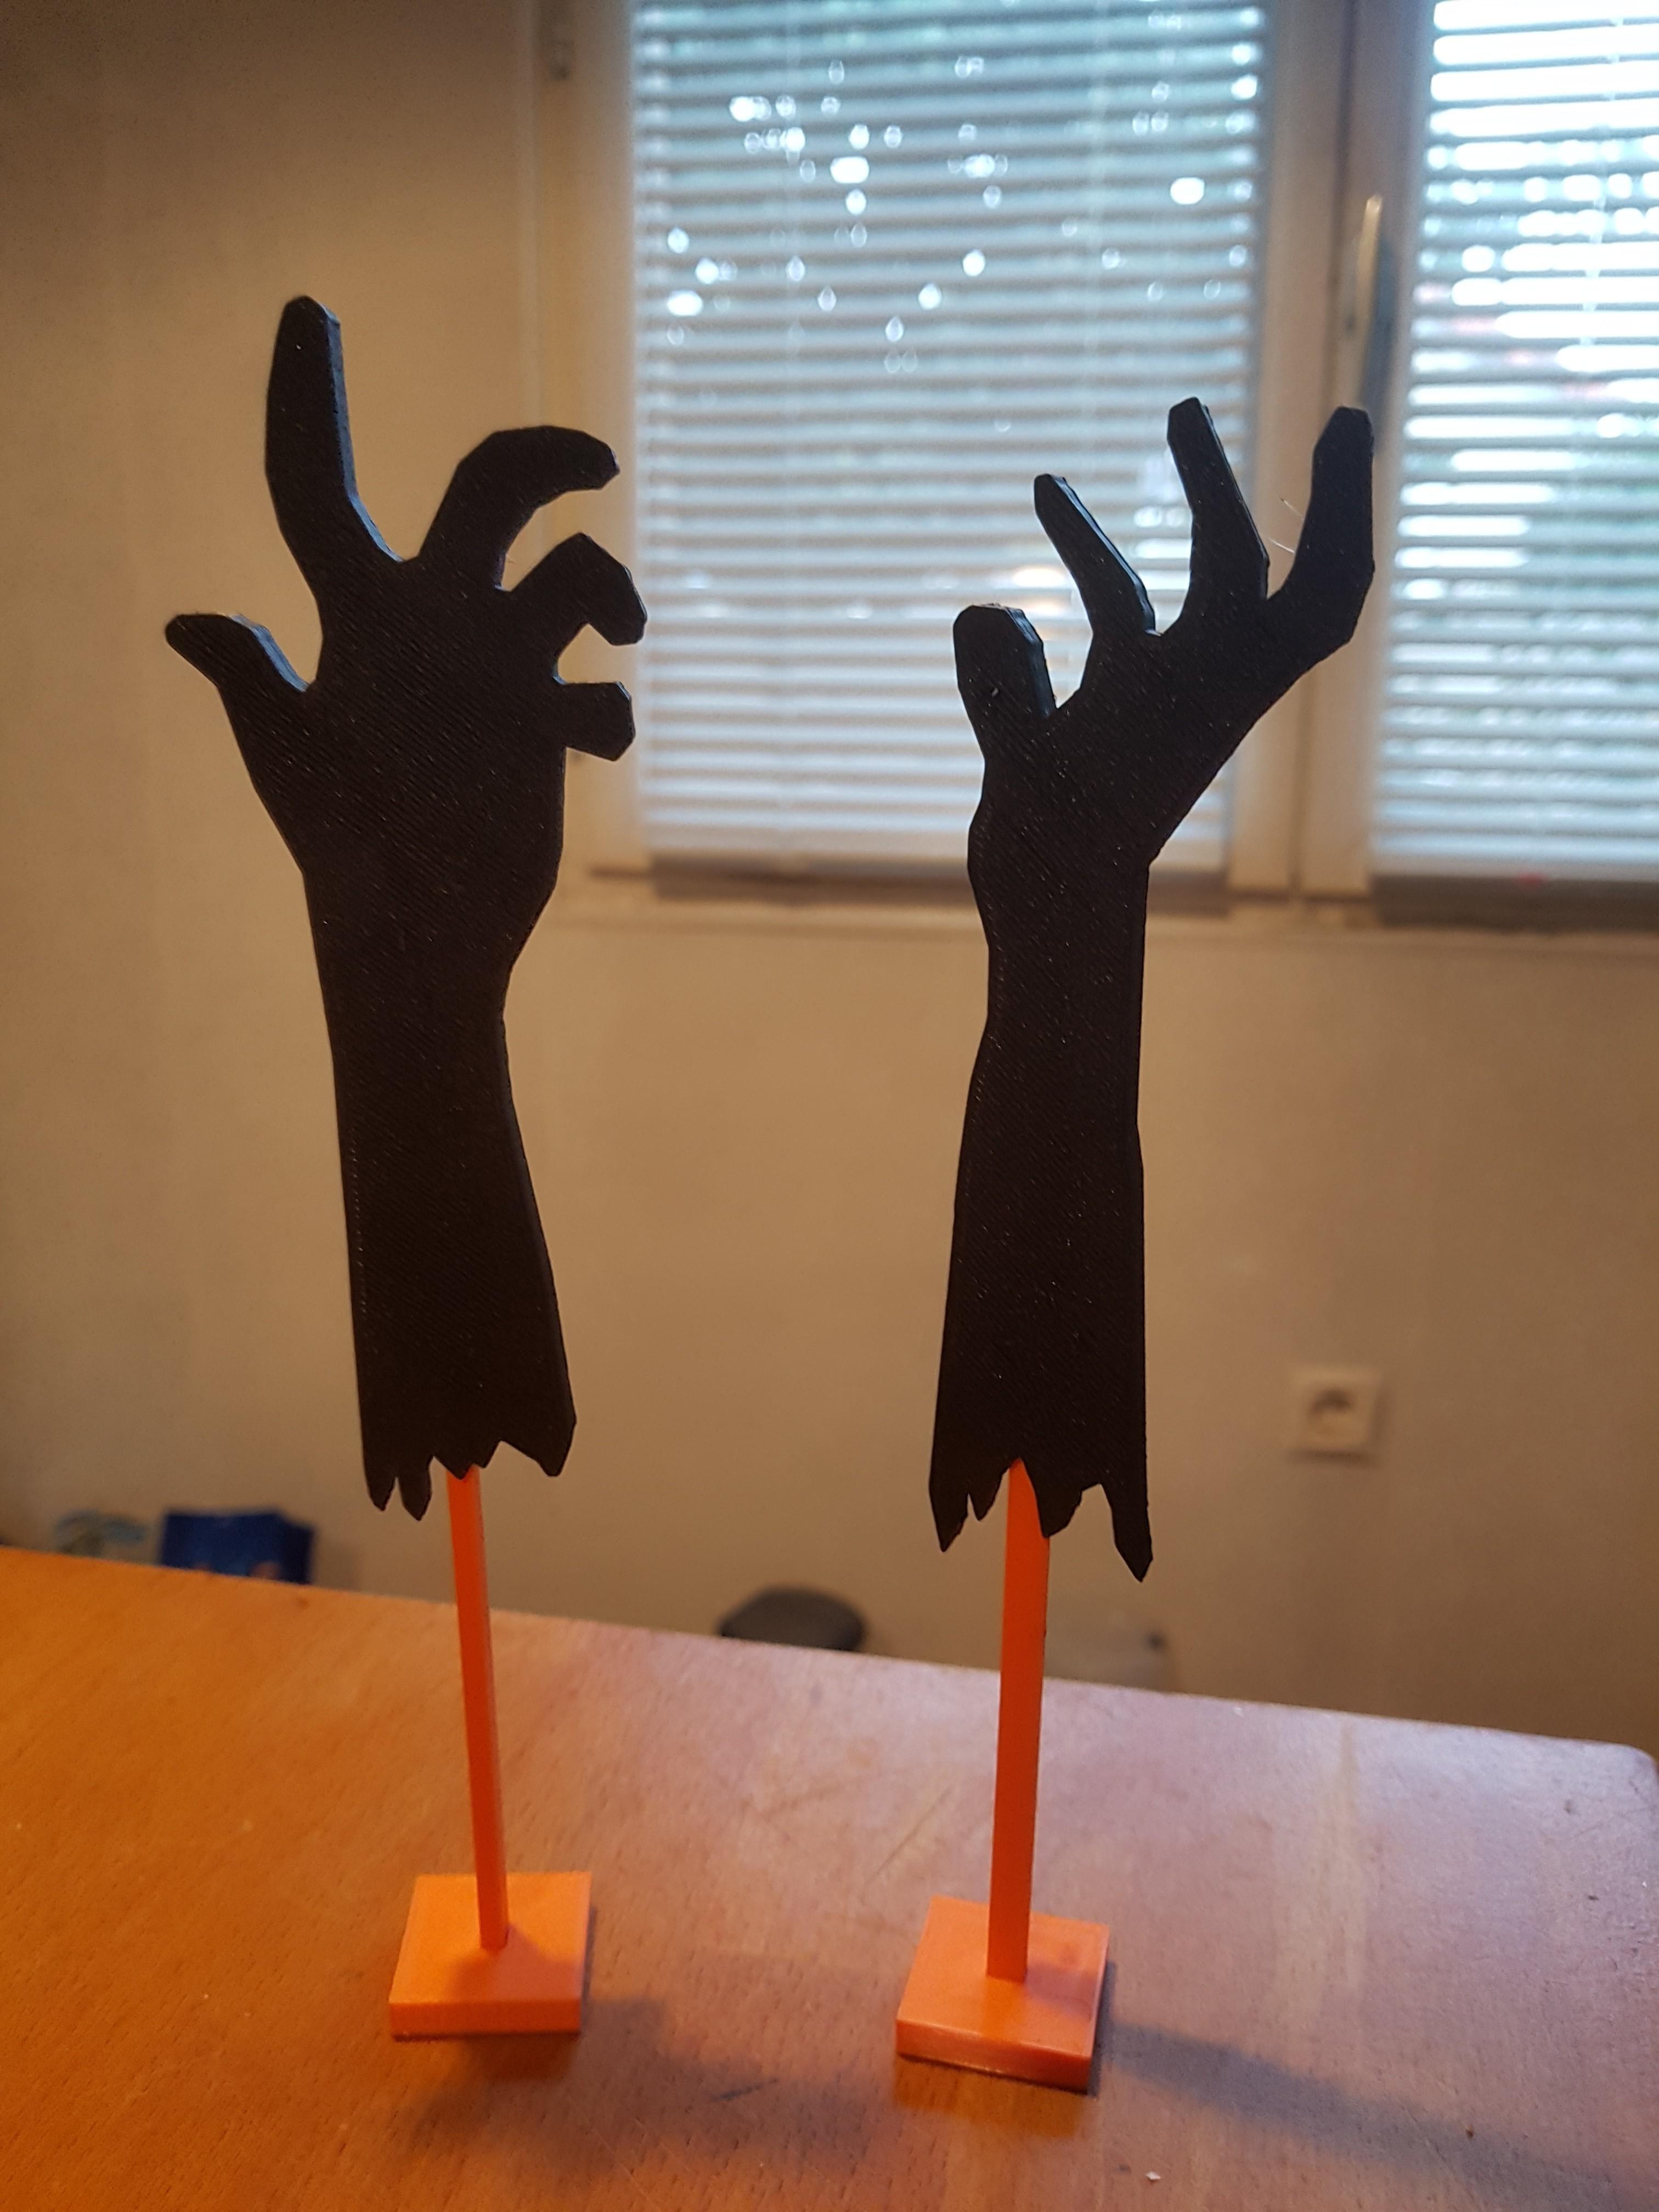 20181010_090915.jpg Download free STL file living dead arm • 3D printer template, catf3d